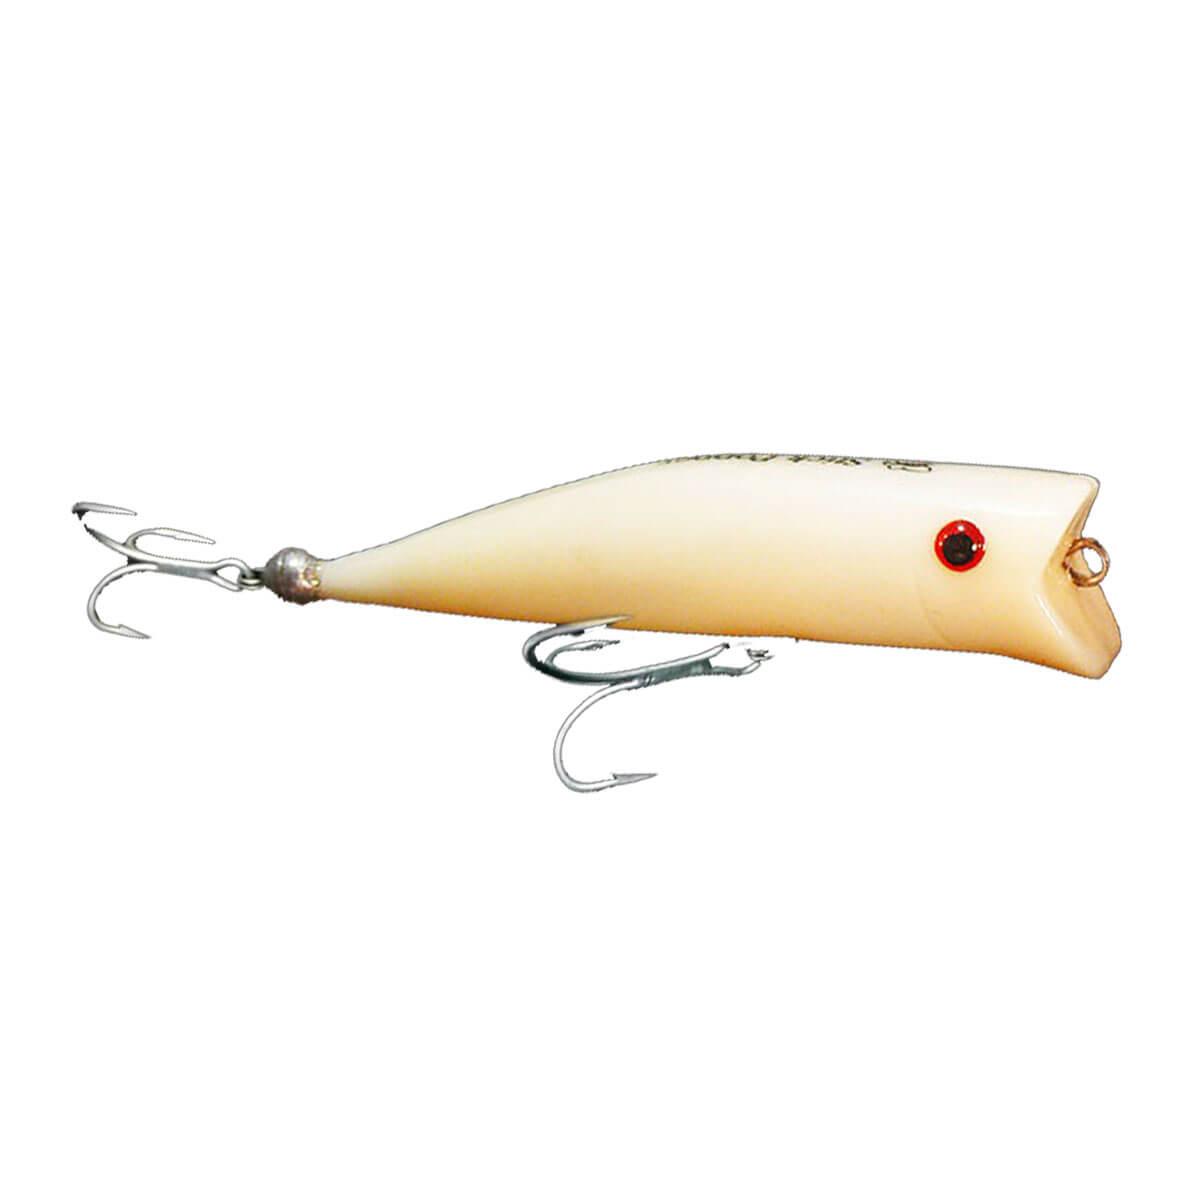 Isca Artificial Borboleta Stick Popper  - Pró Pesca Shop